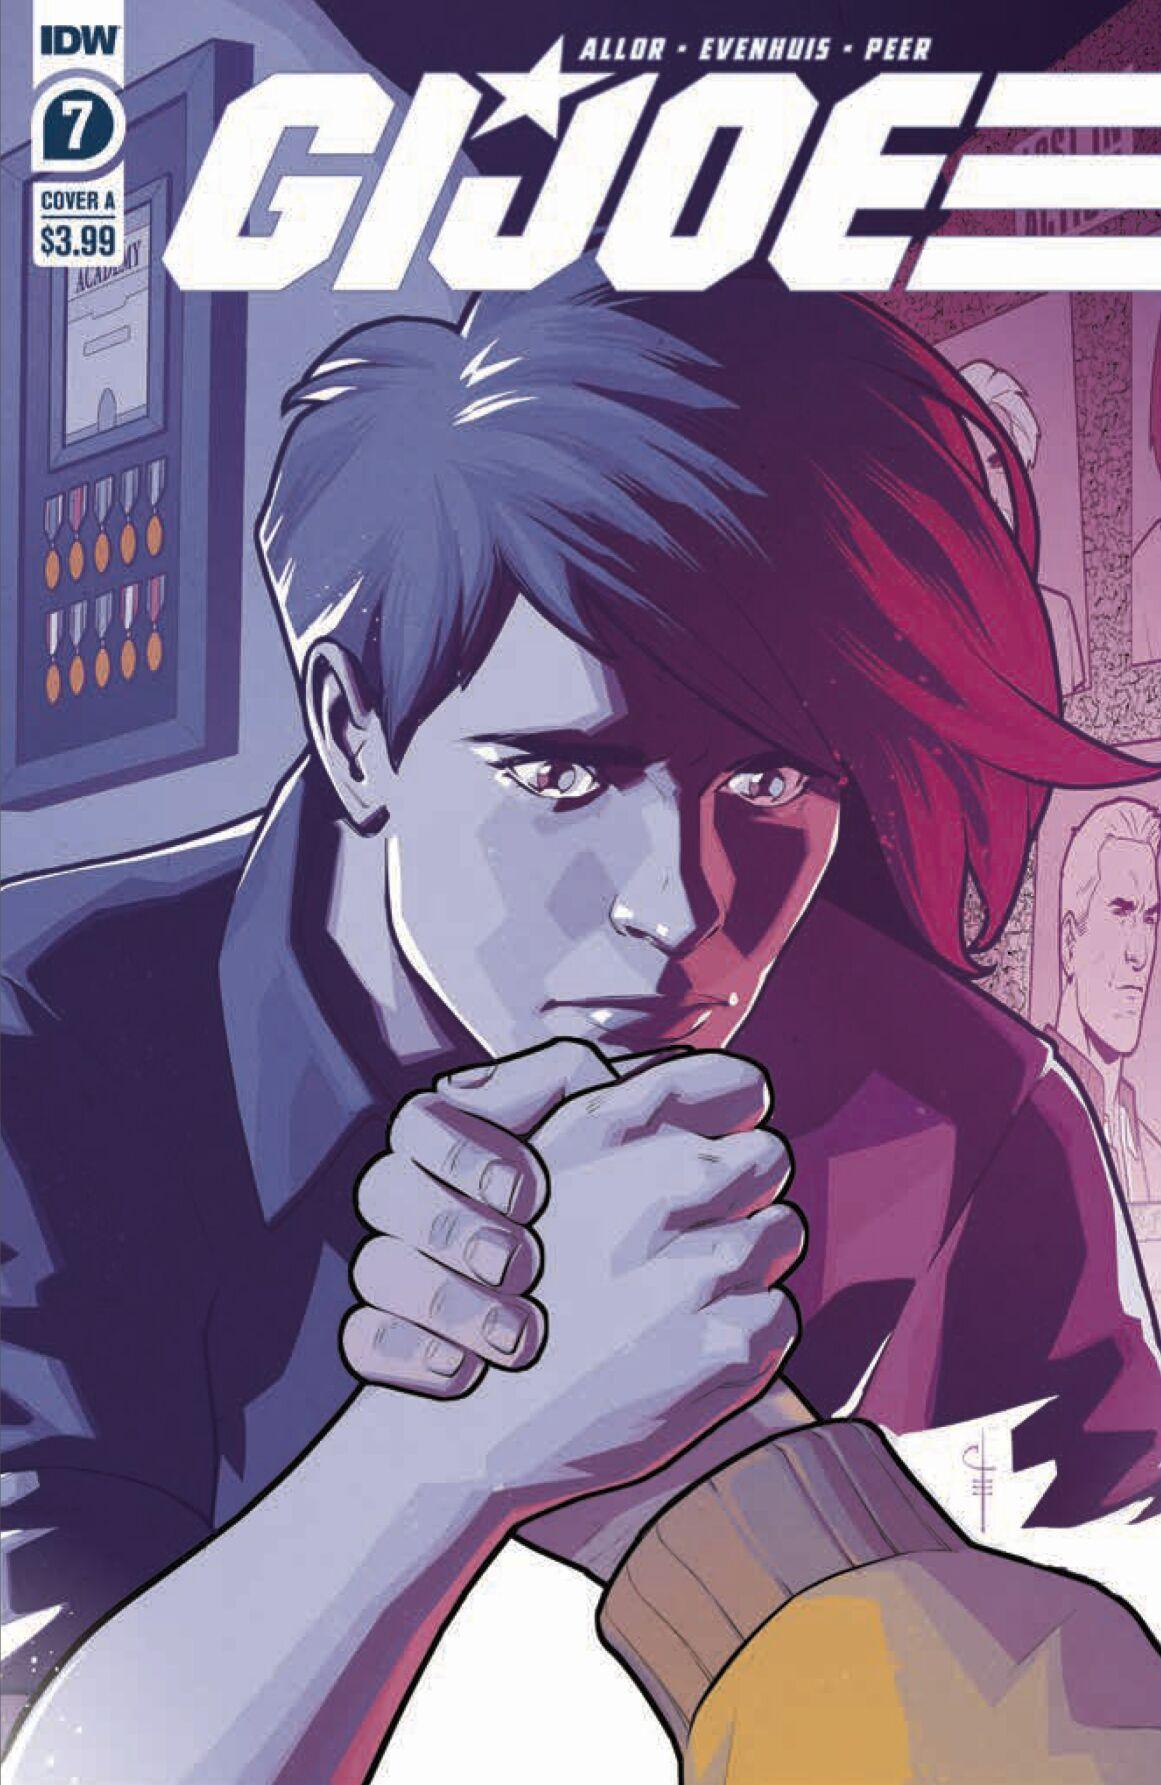 G.I Joe tackles PTSD in new issue